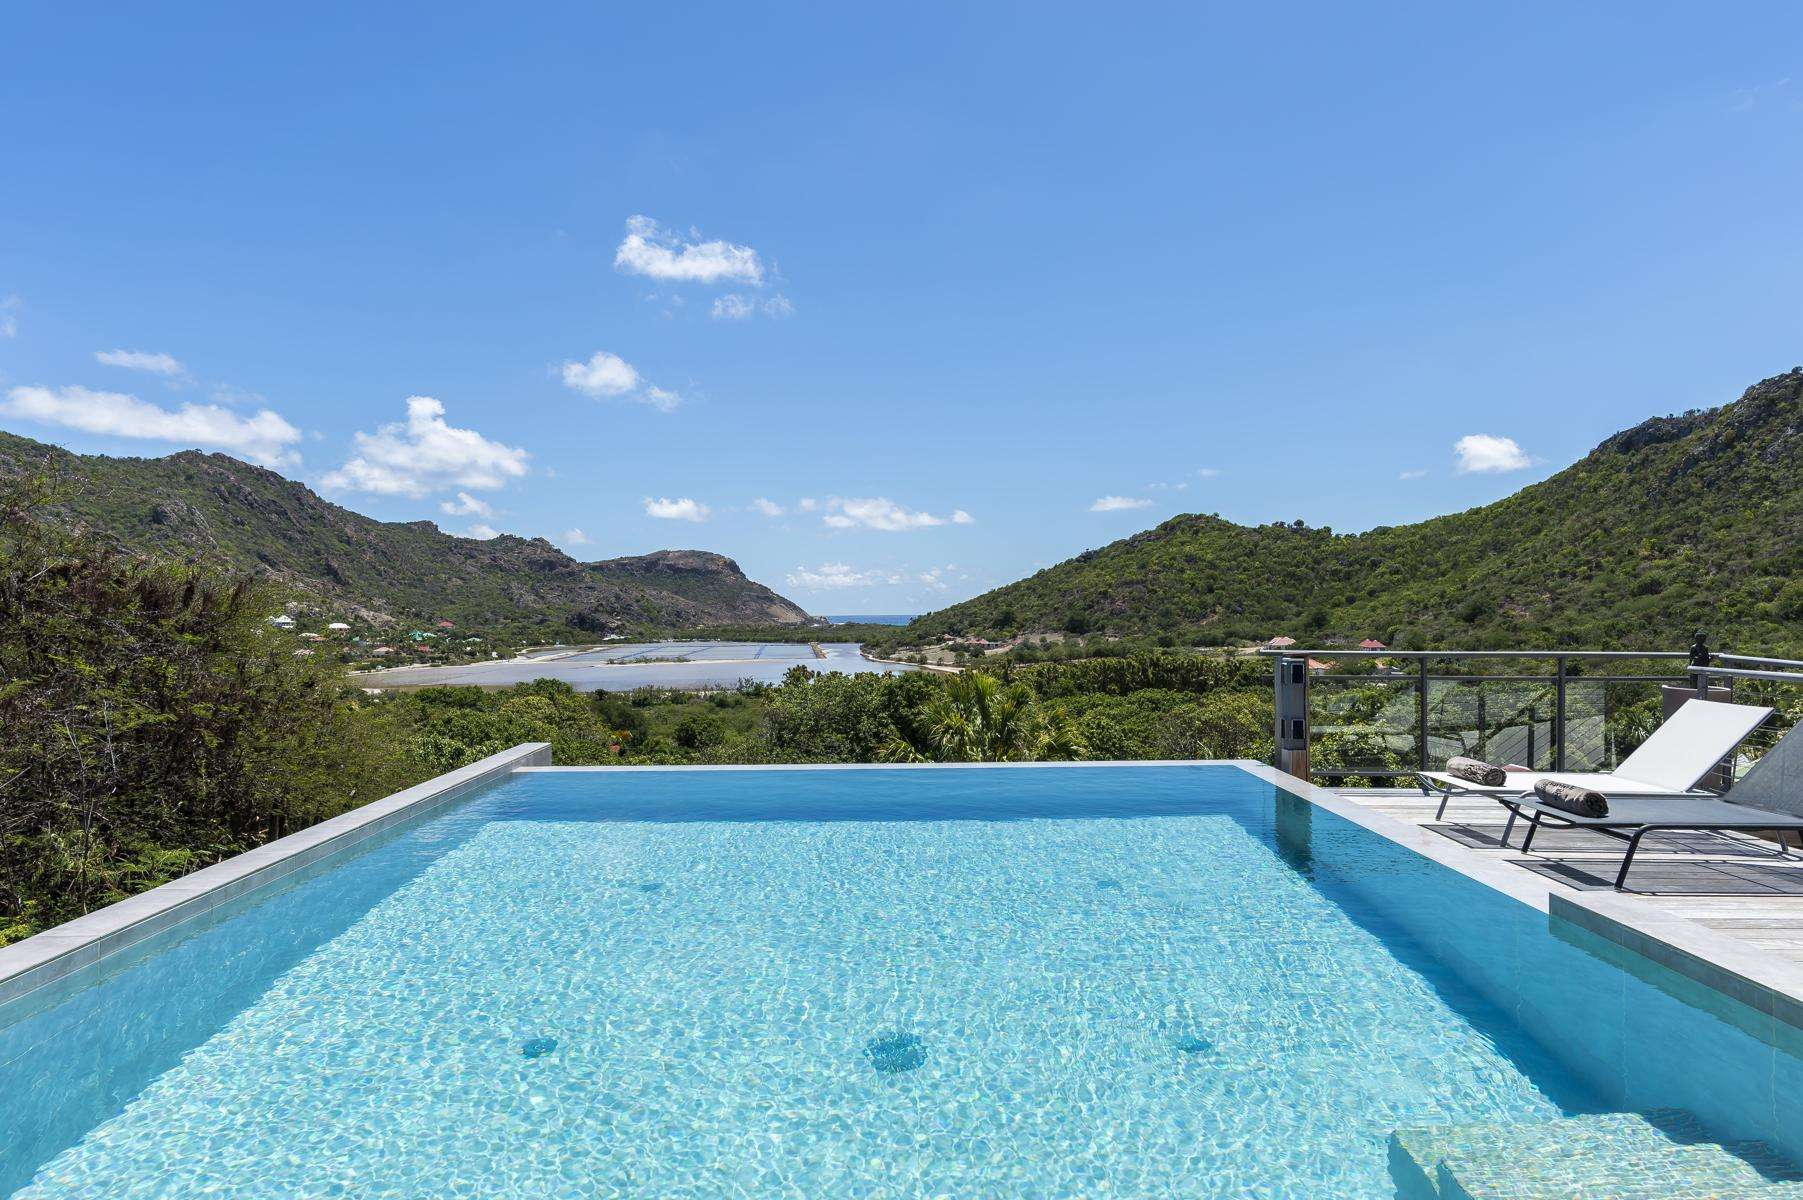 Luxury villa rentals caribbean - St barthelemy - Shell beach - Harry - Image 1/18